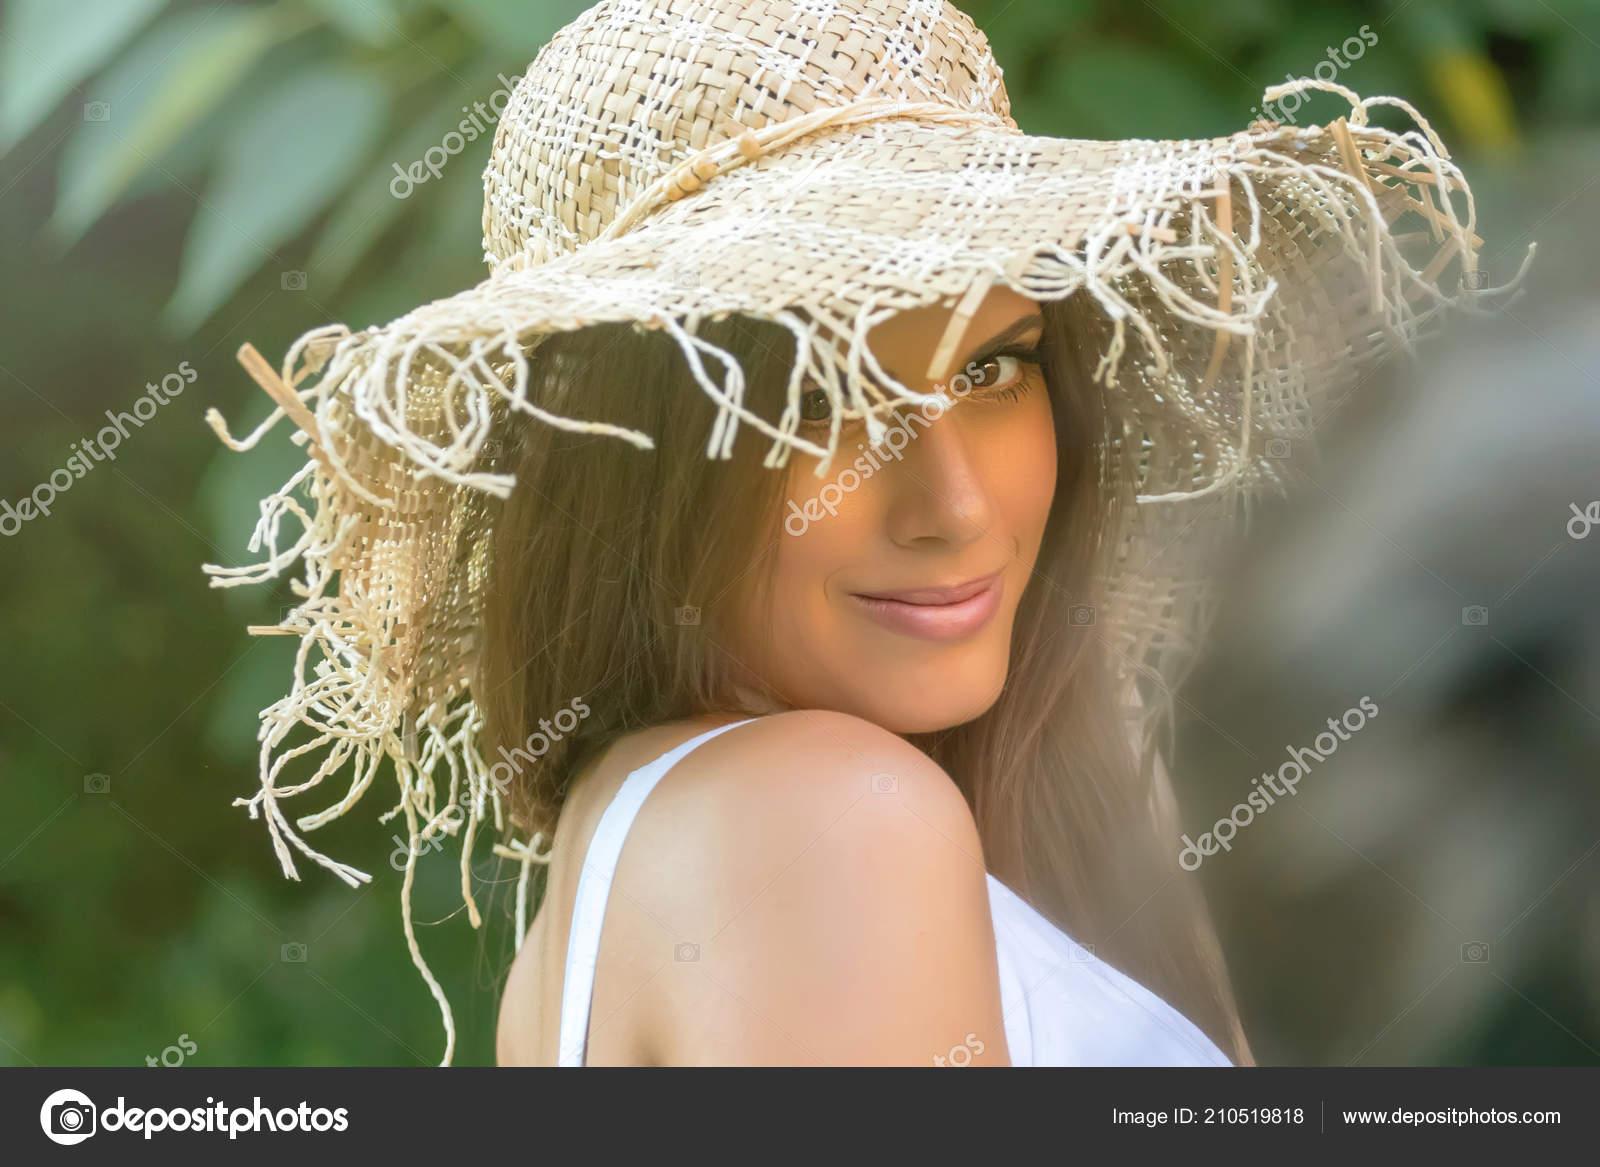 Beautiful Woman Hat Summer Day Outdoors Fashion Lifestyle